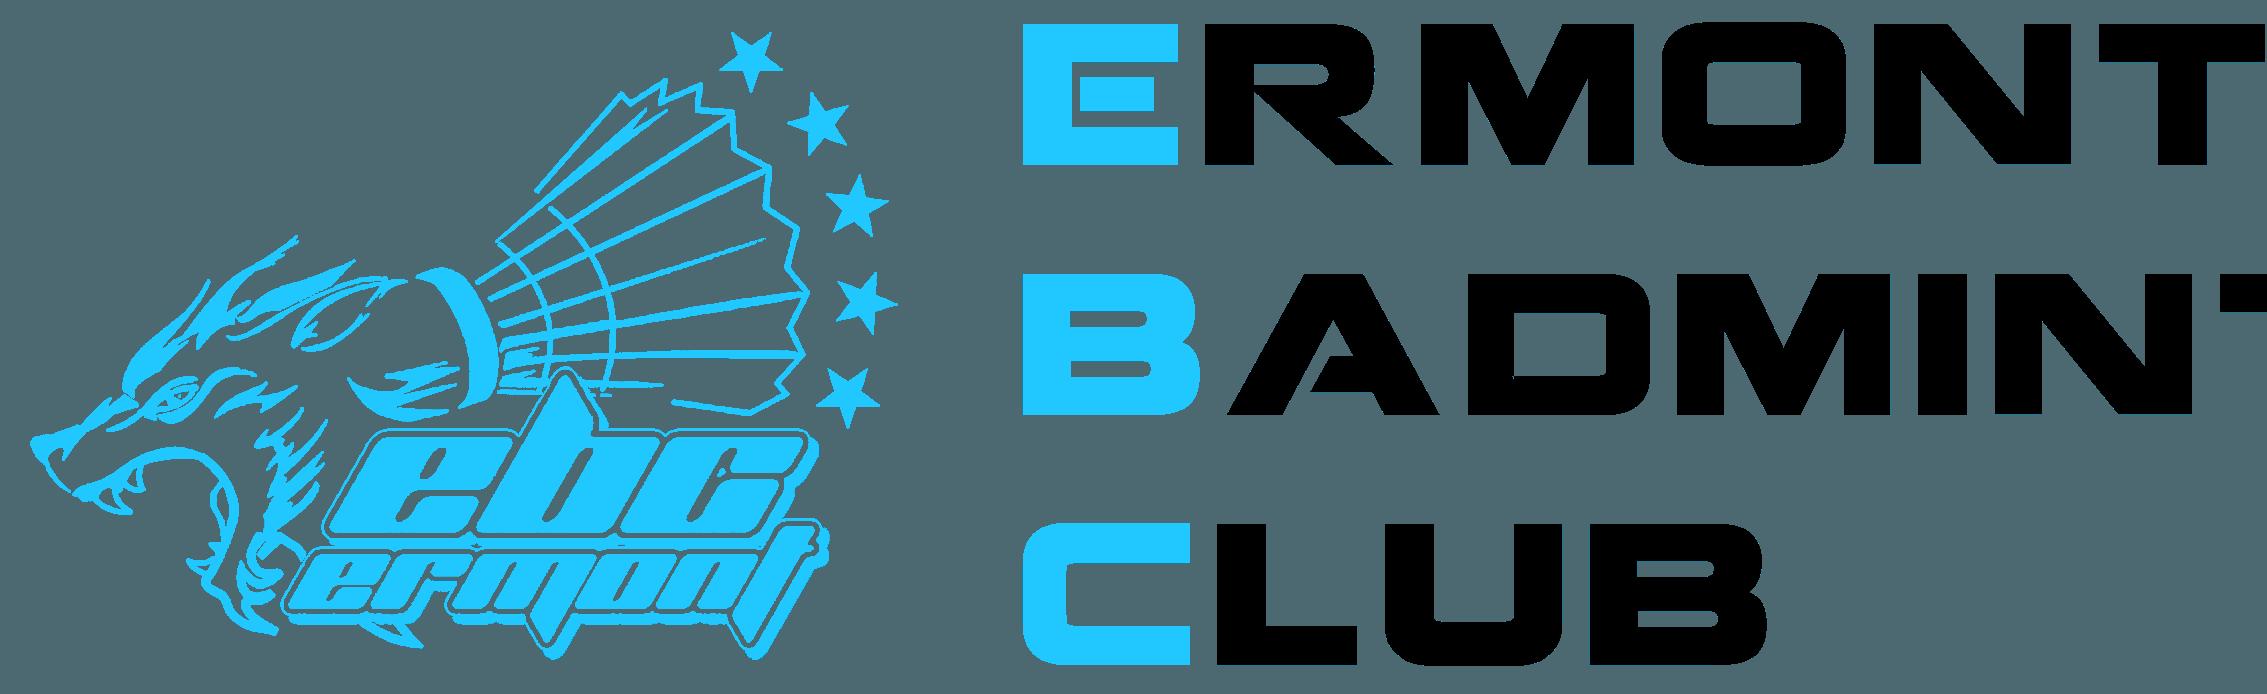 Ermont Badminton Club